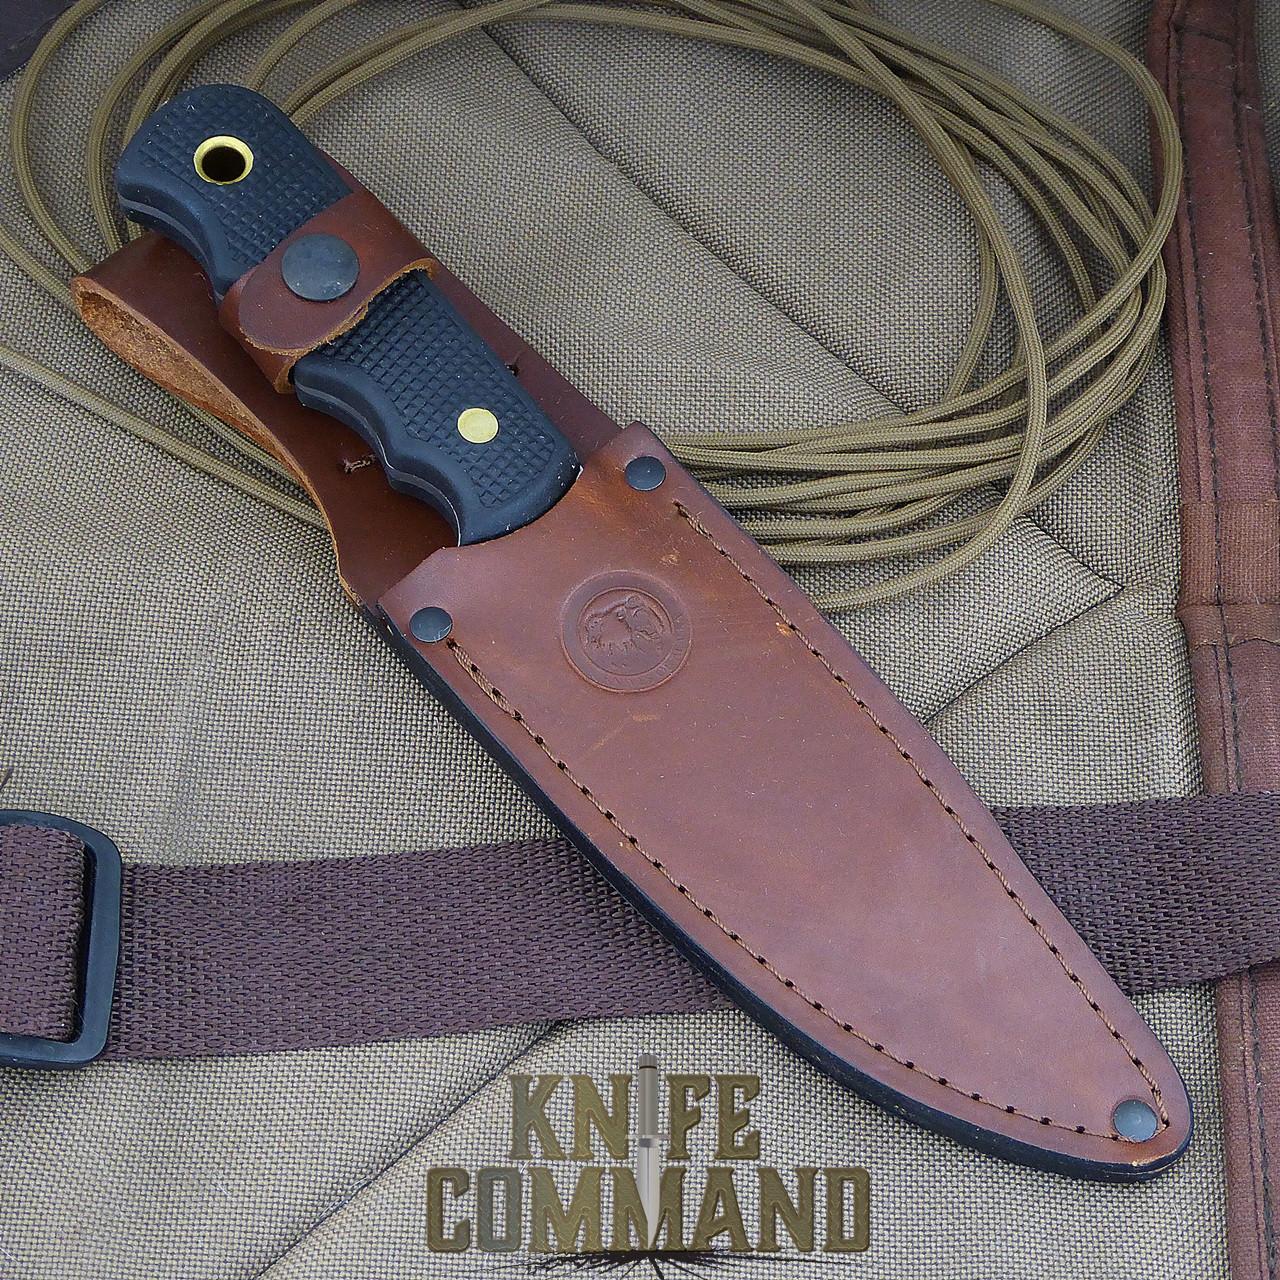 Knives of Alaska Bush Camp Hunting Knife.  High quality leather sheath.